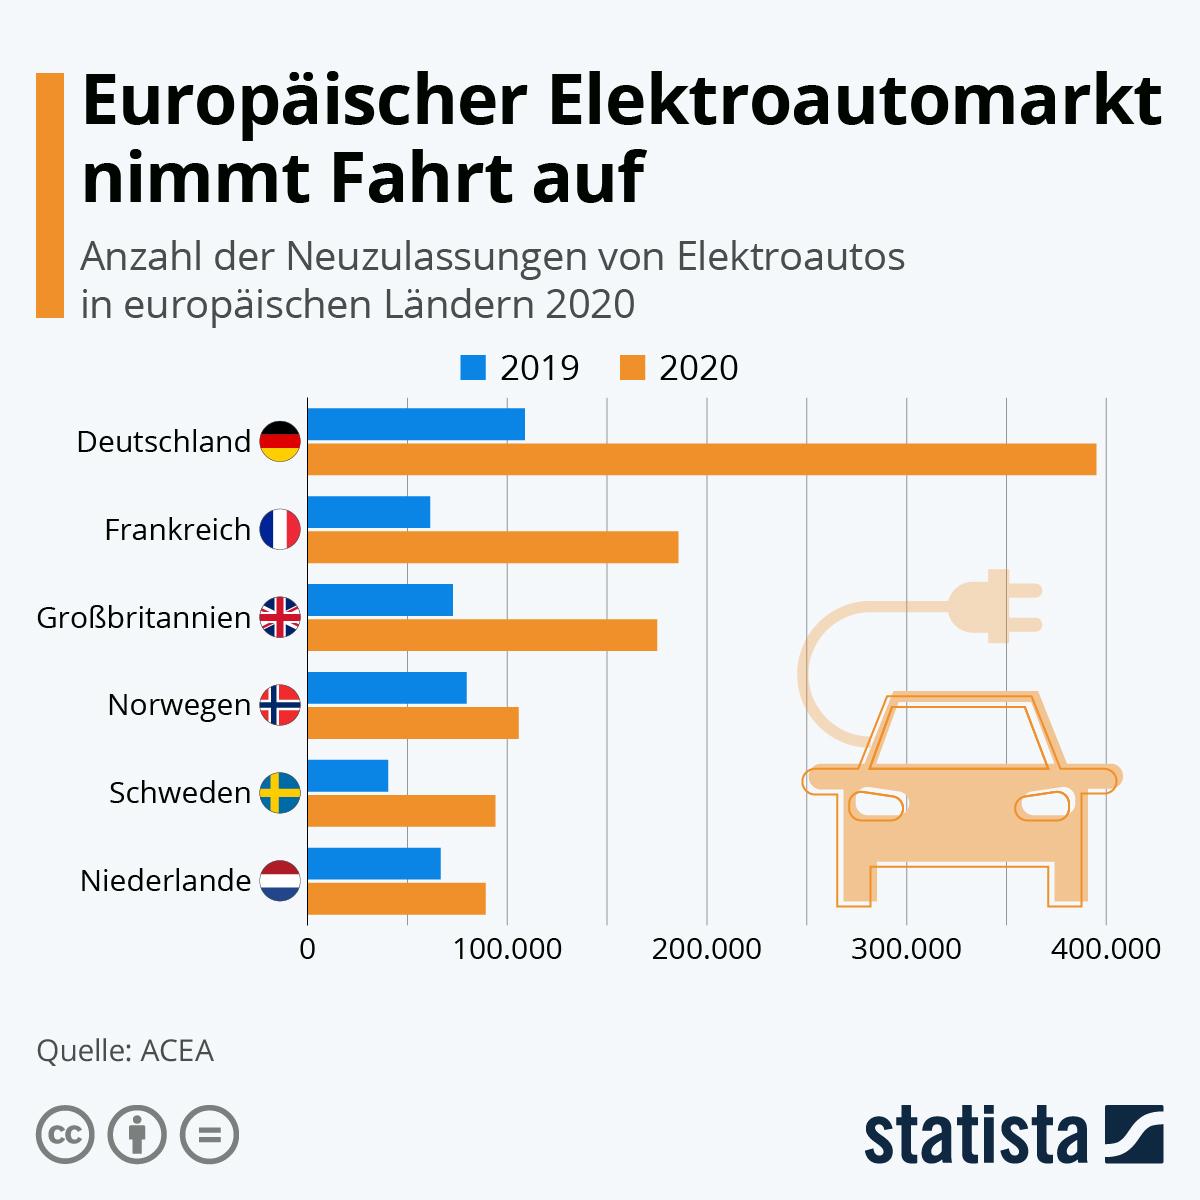 Infografik: Europäischer Elektroautomarkt nimmt Fahrt auf | Statista